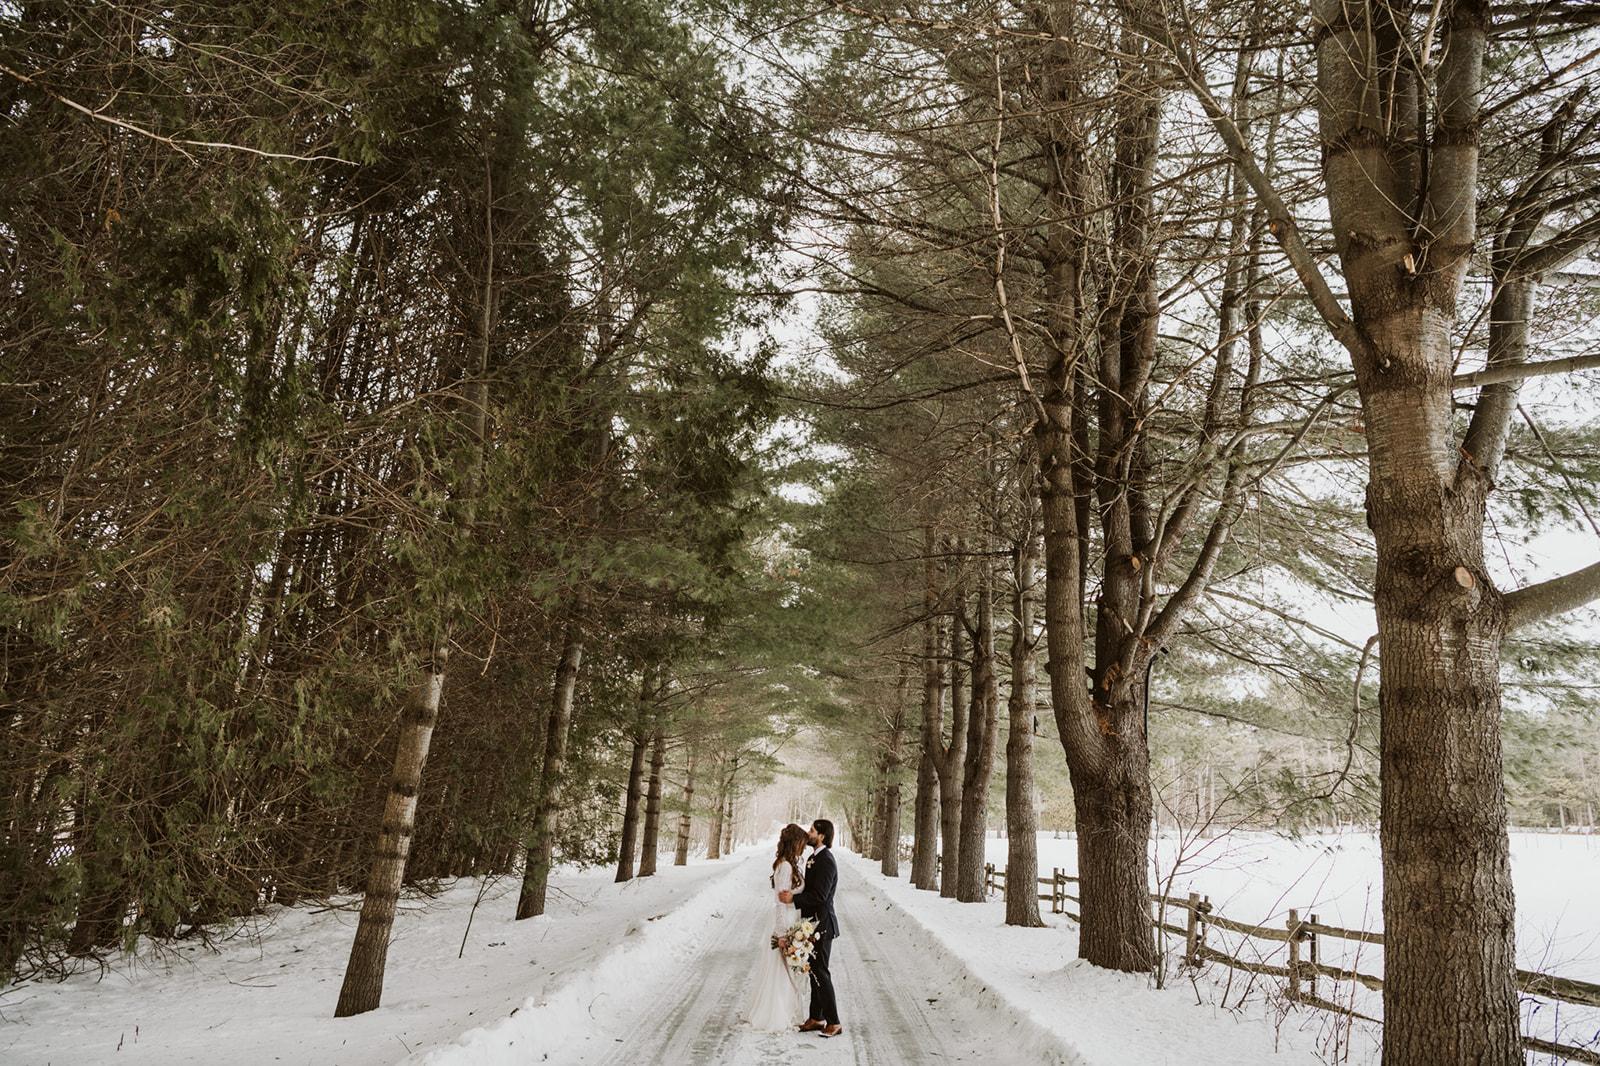 Brookslands-Farm-Winter-Shoot-Sneaks-18.